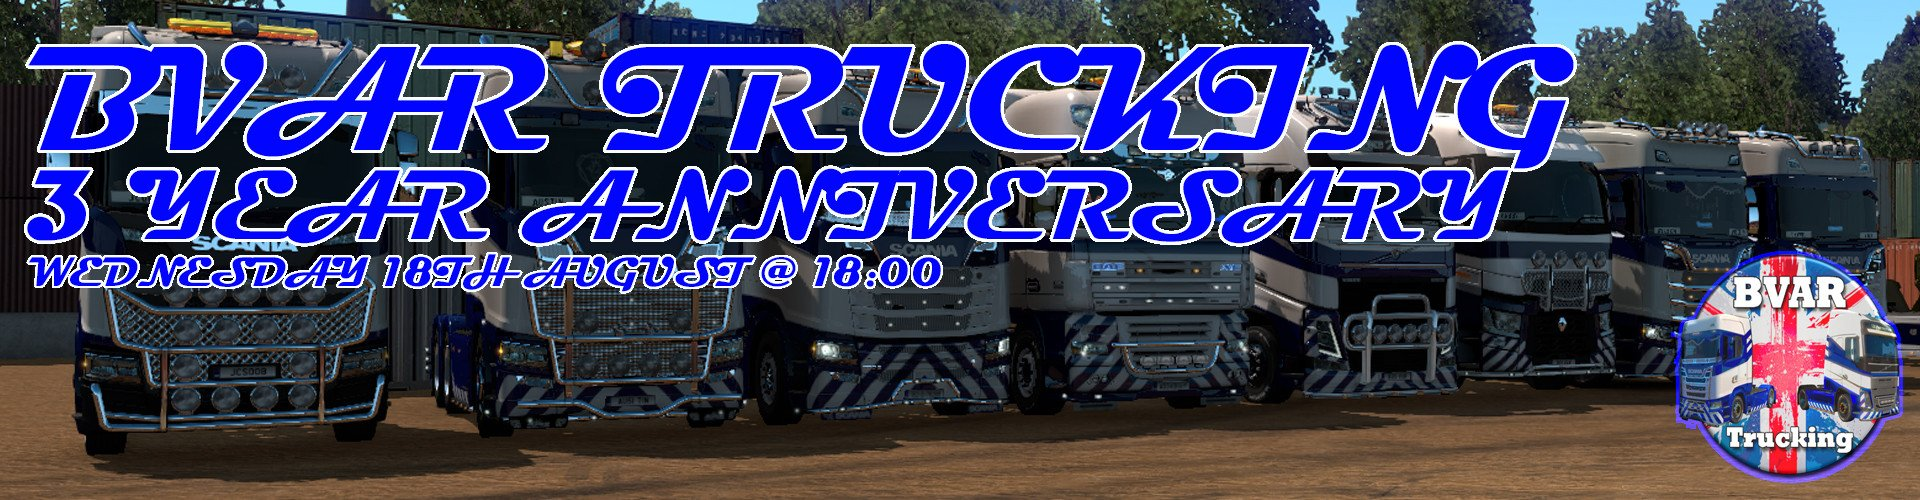 BVAR Trucking 3 Year Anniversary